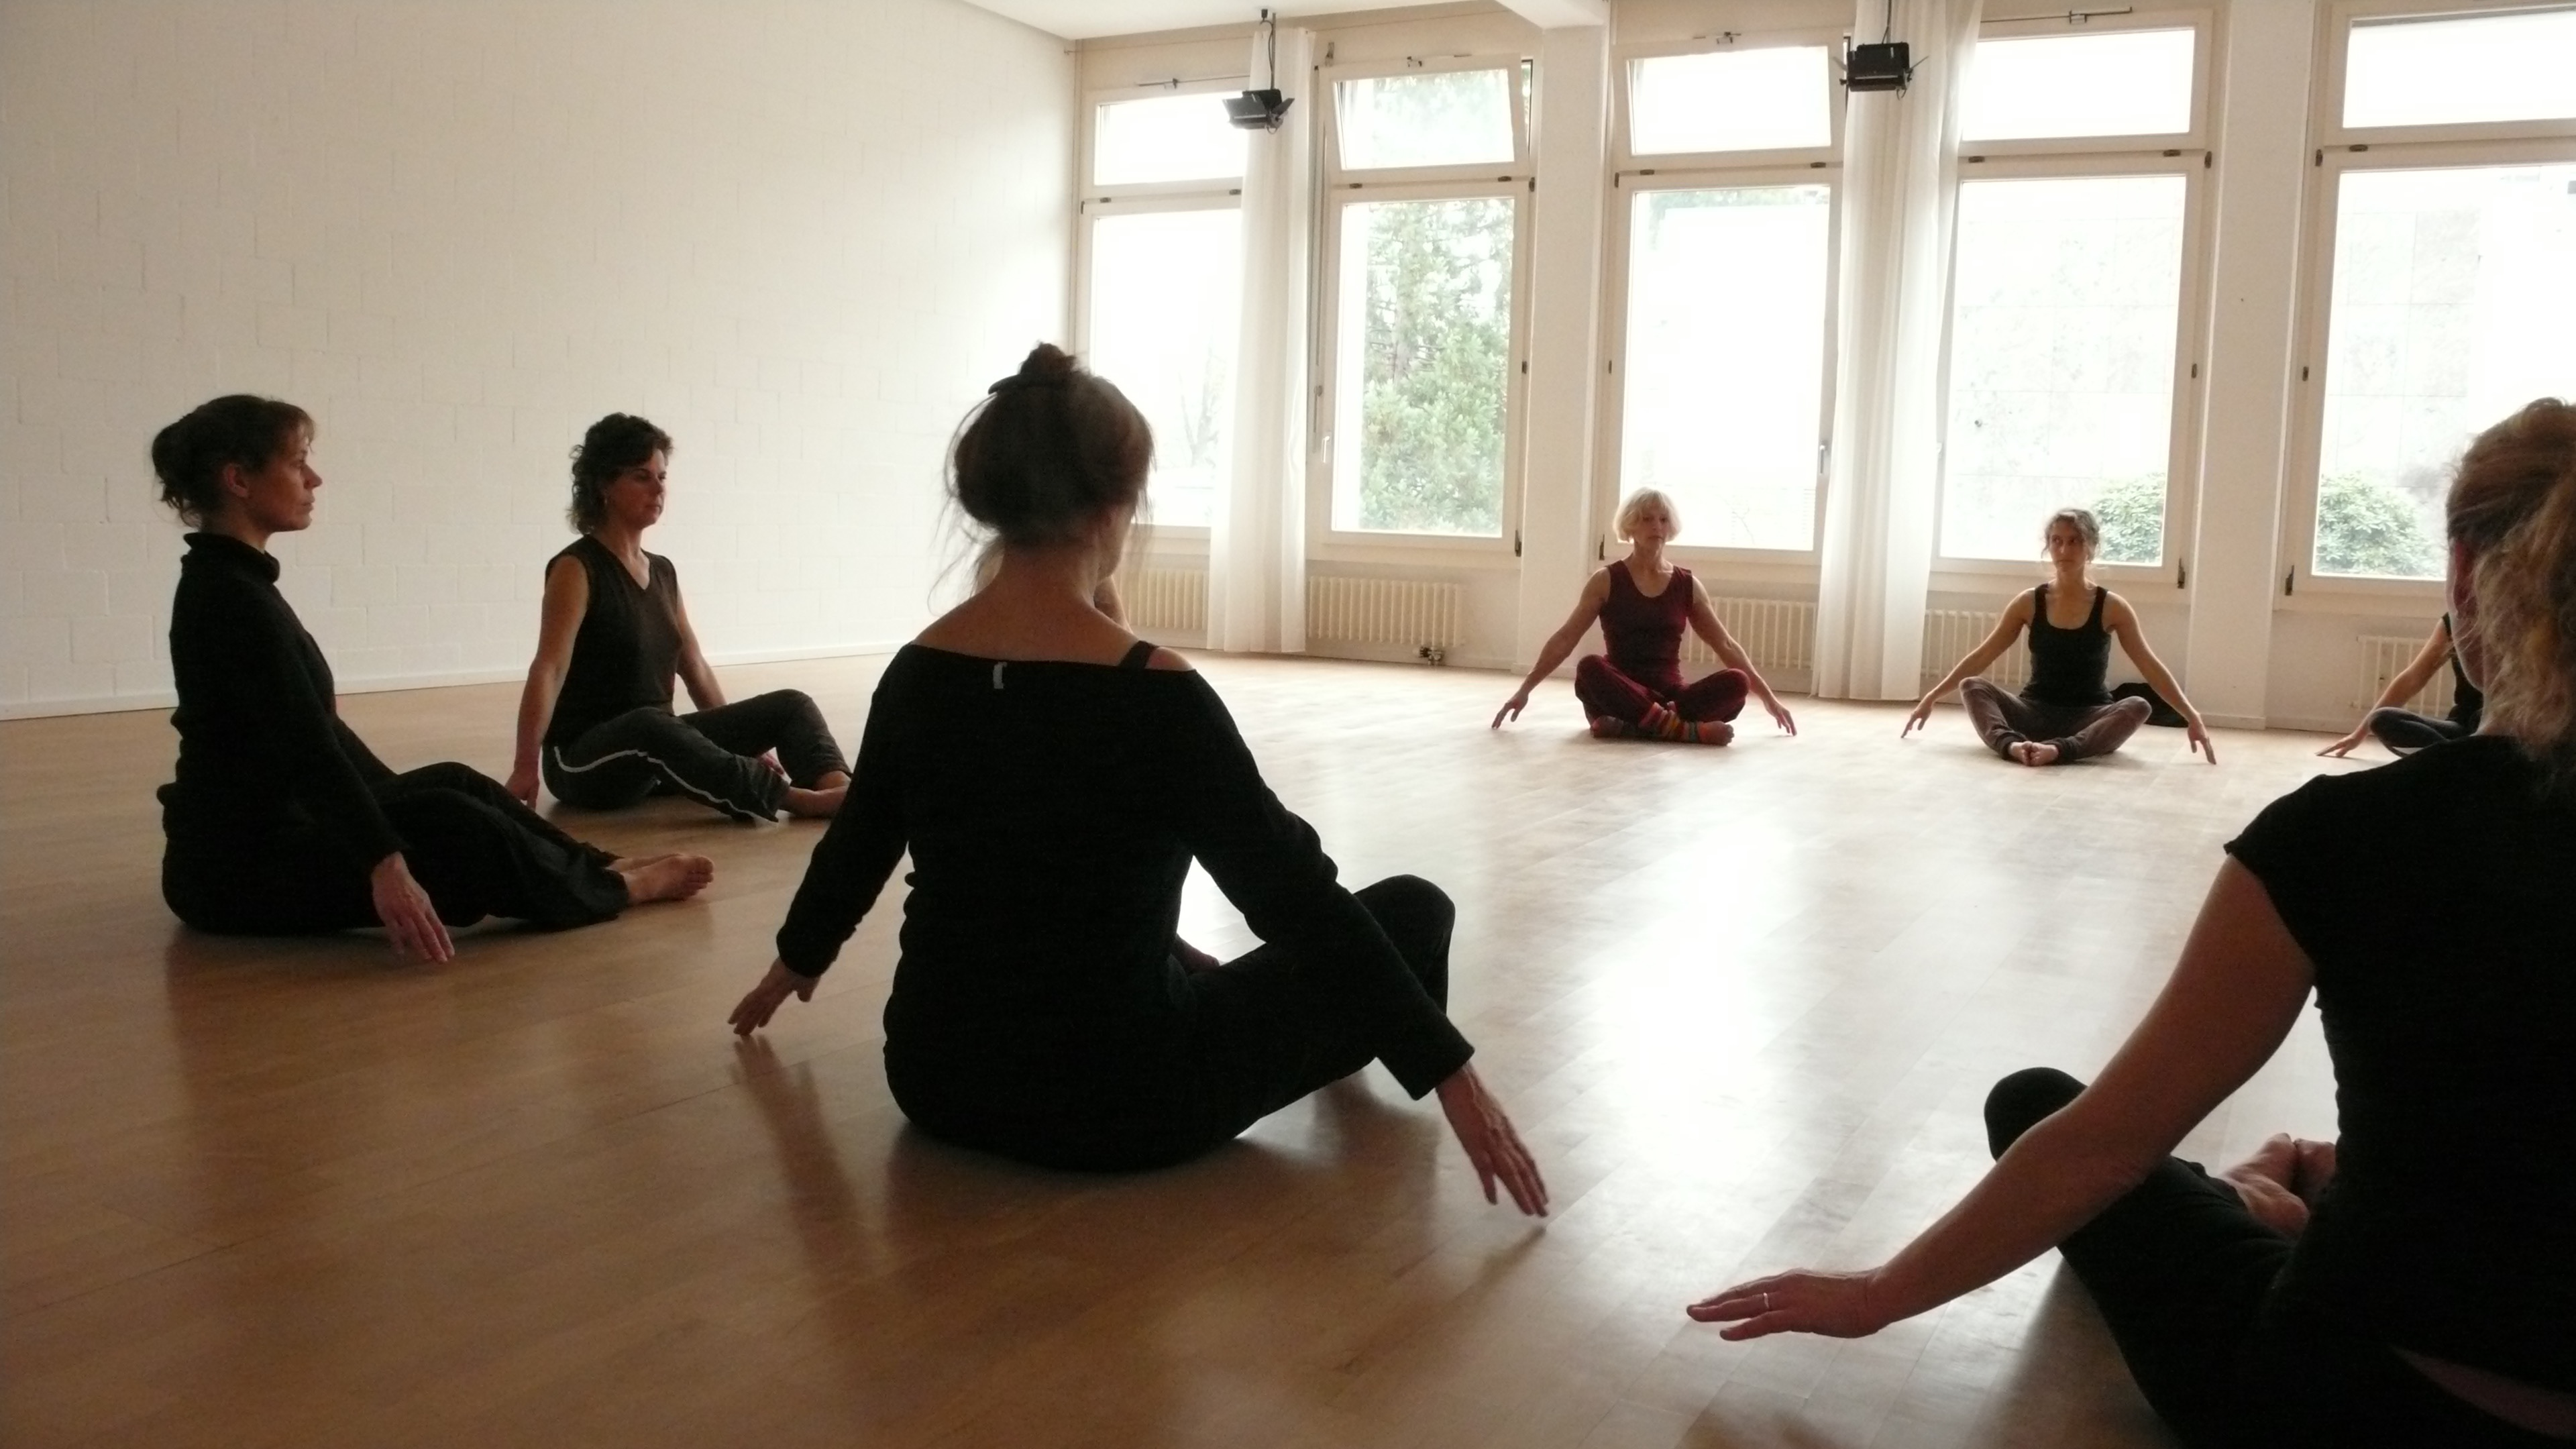 ausbildung-tanz-bewegung-schweiz